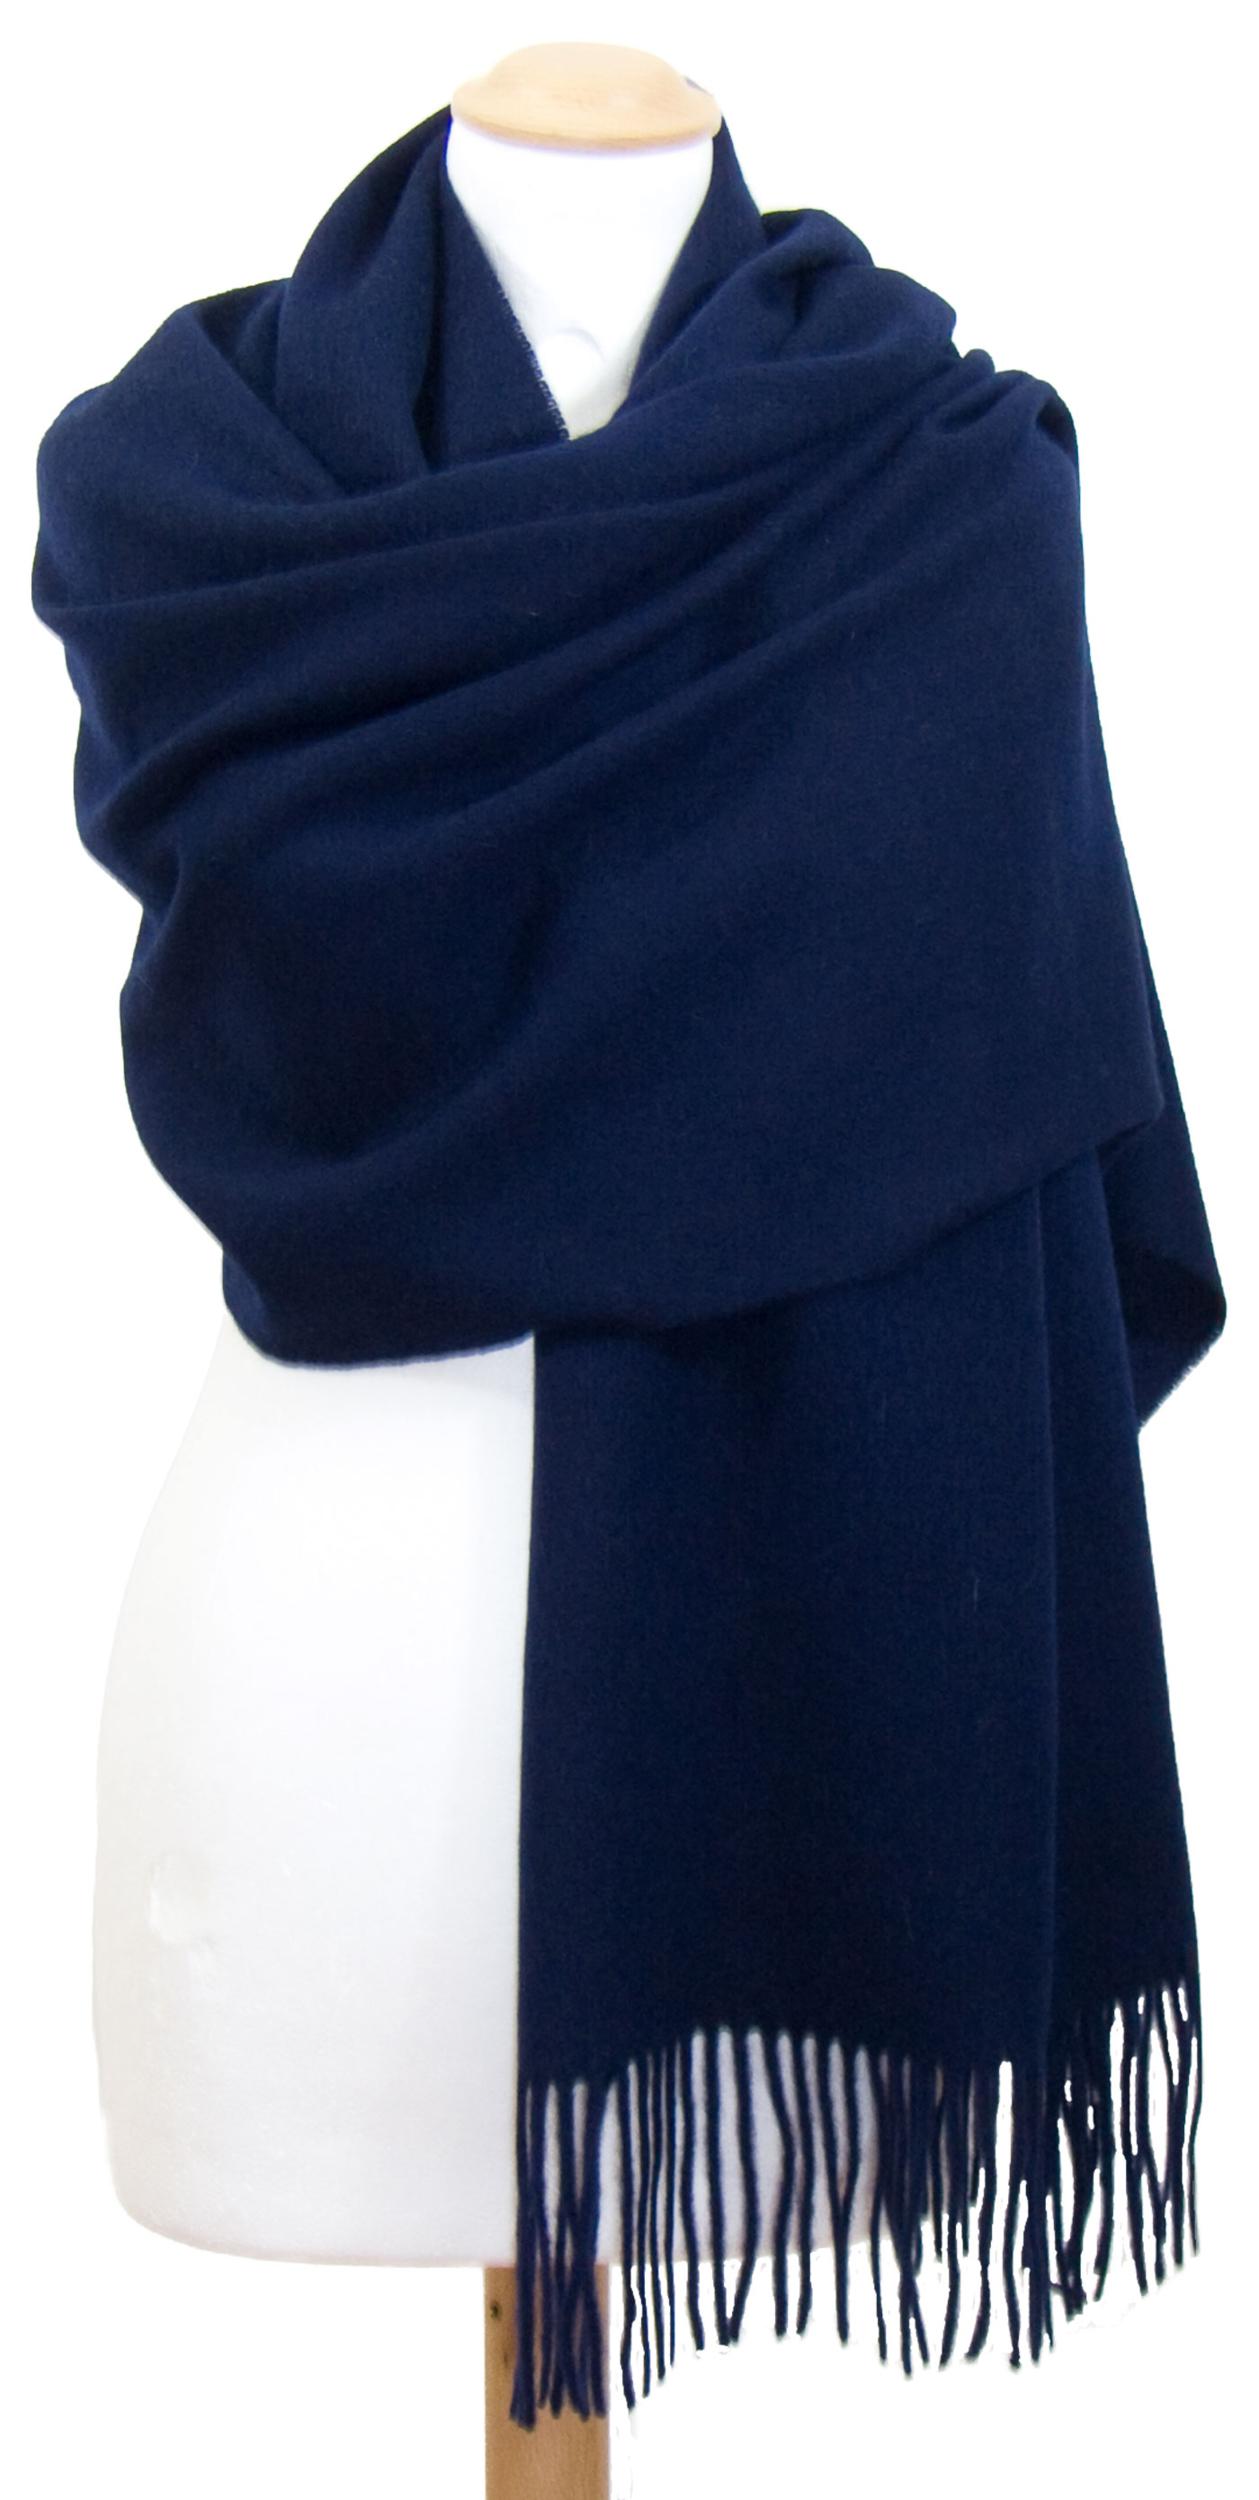 Etole bleu marine en laine premium